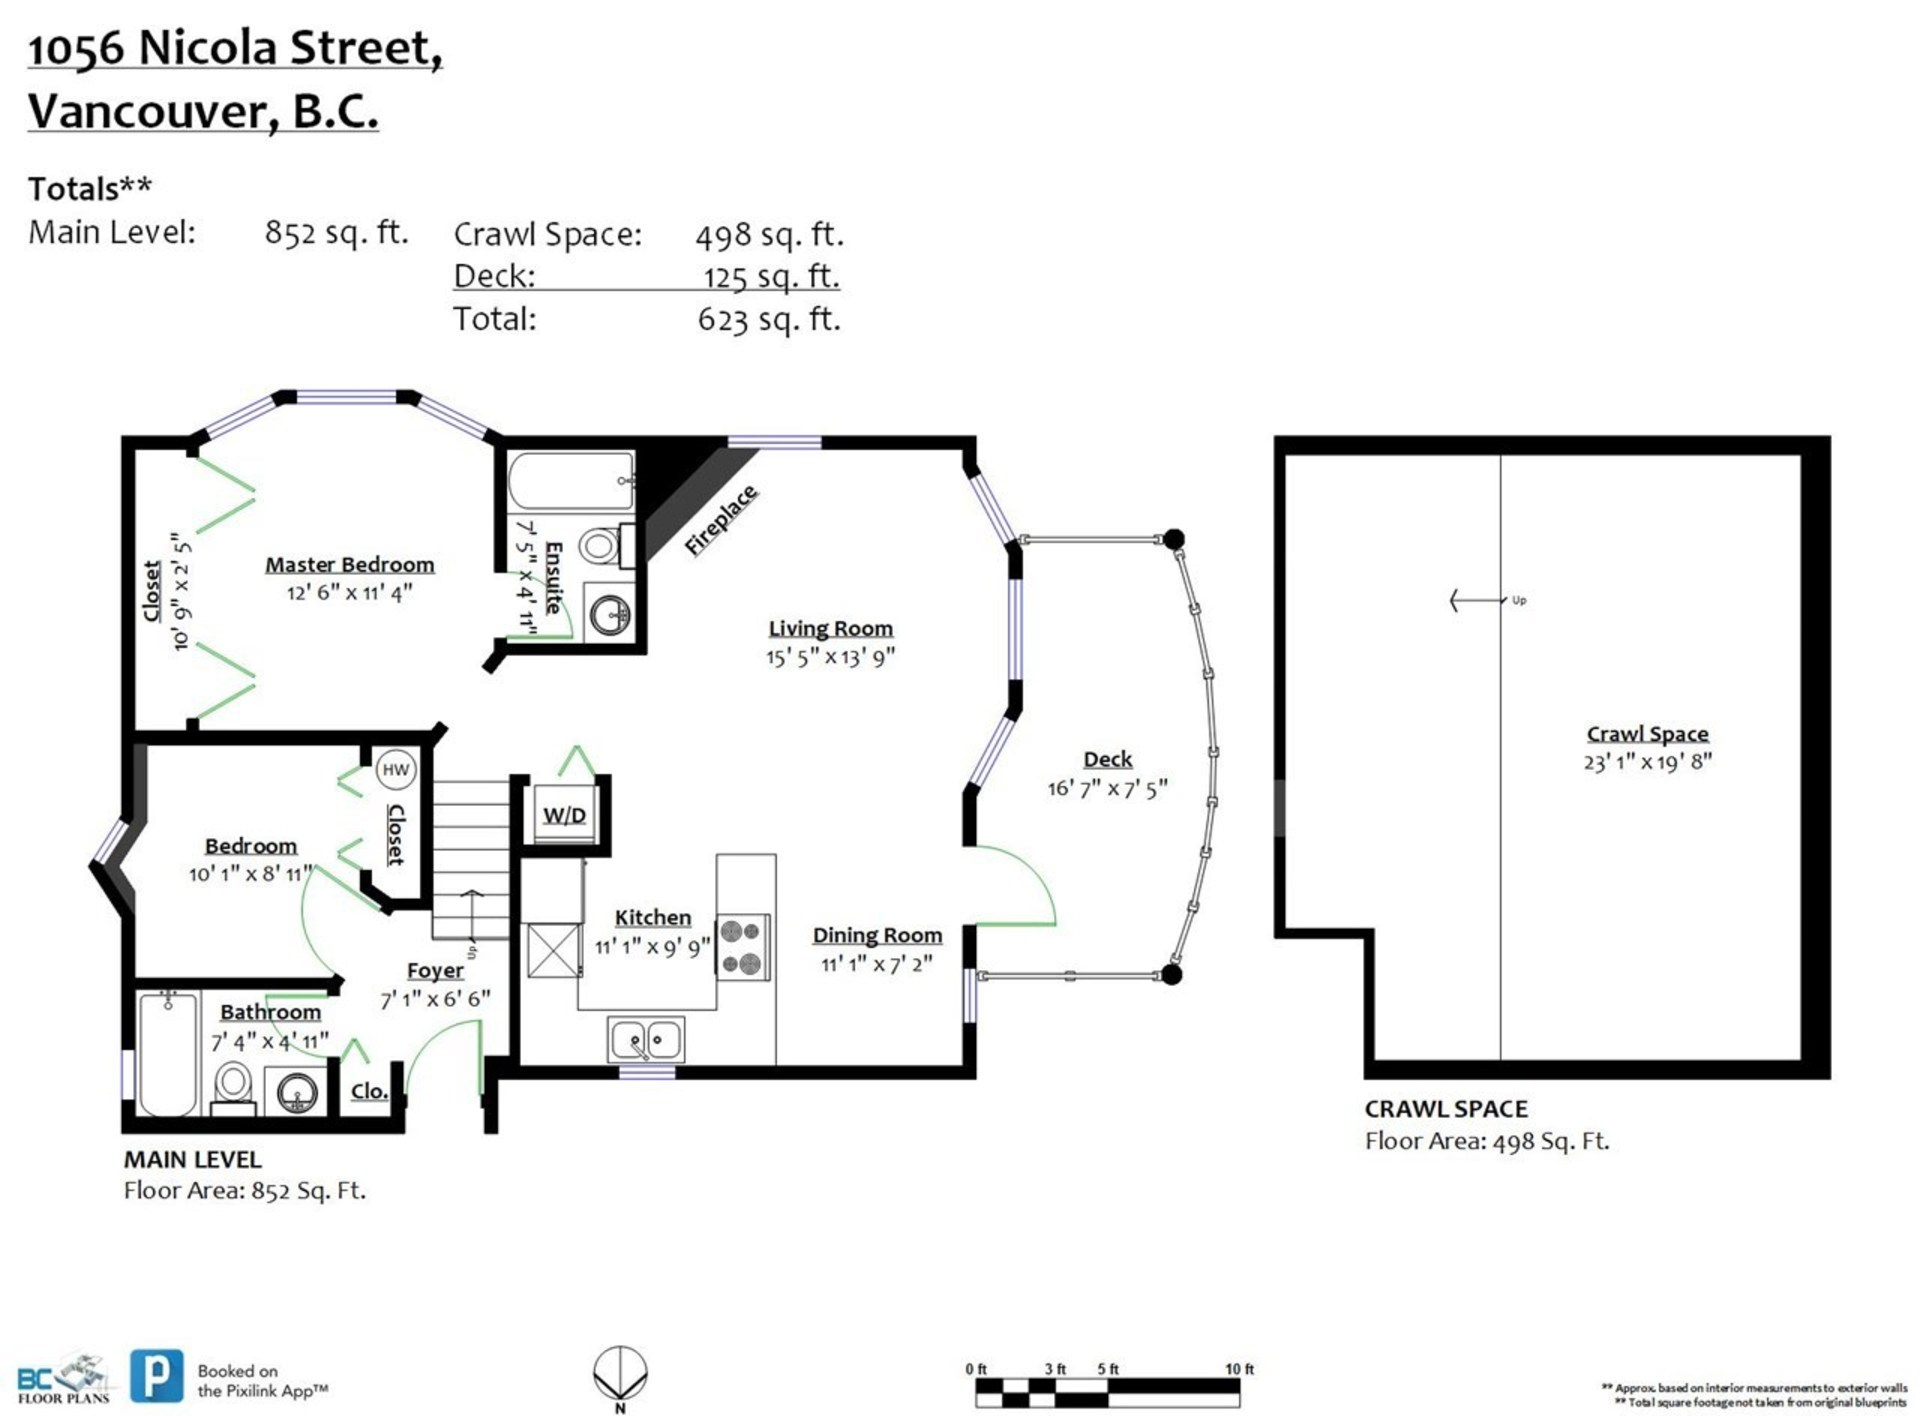 1056-nicola-street-west-end-vw-vancouver-west-20 at 1056 Nicola Street, West End VW, Vancouver West